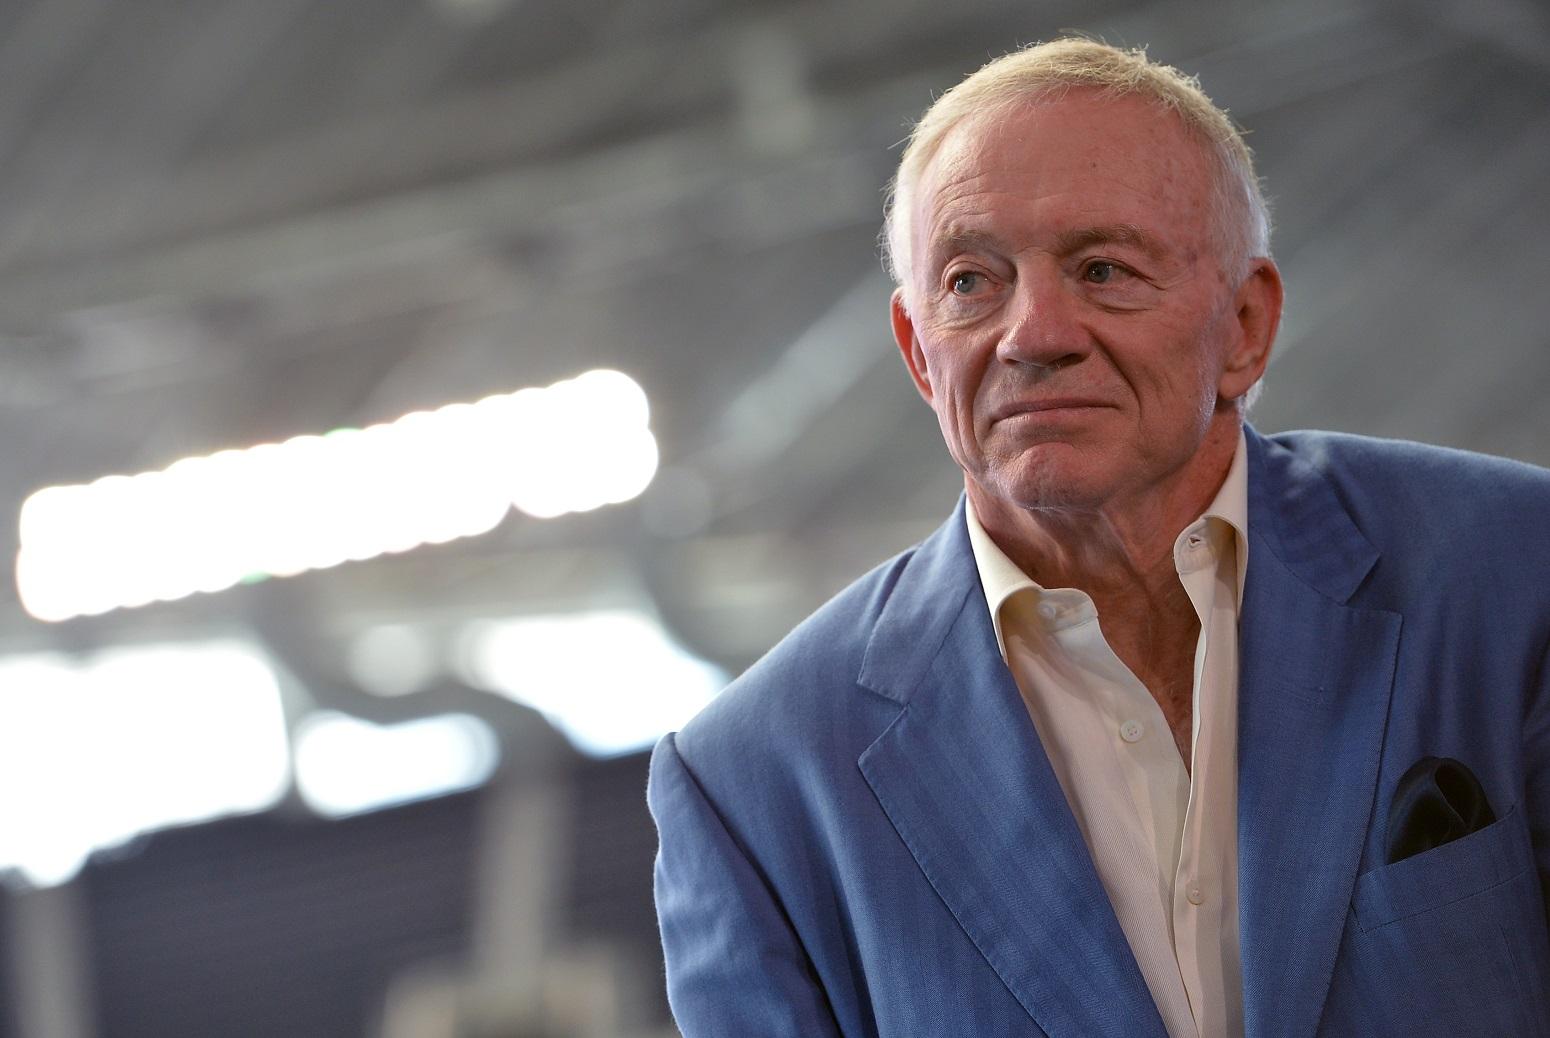 Jerry Jones Super Bowl 45 fiasco cost NFL millions of dollars